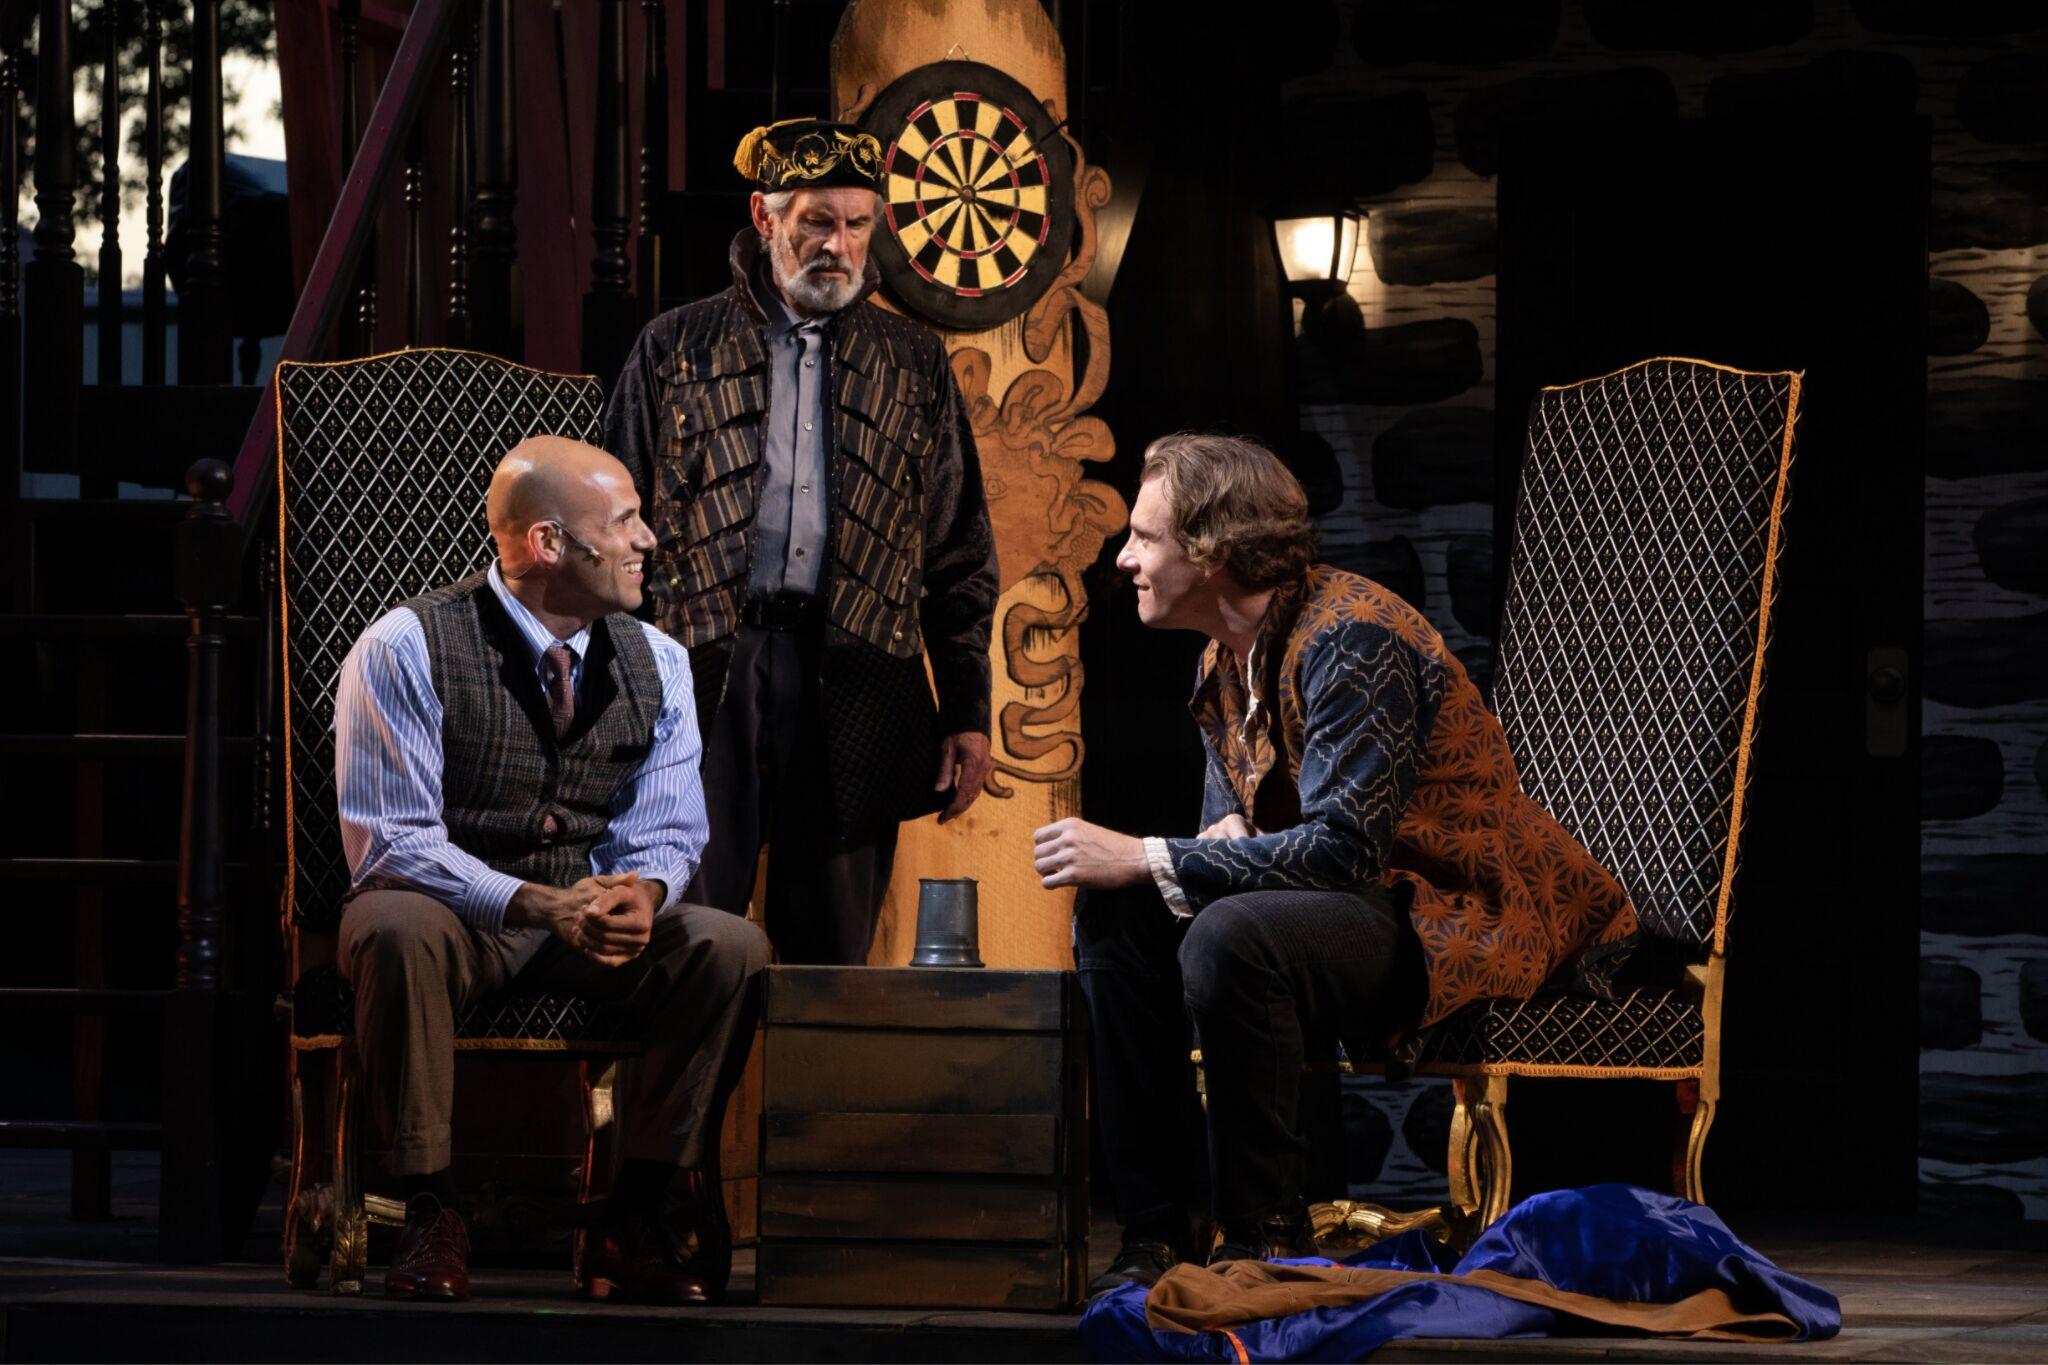 Daniel Duque-Estrada (Posthumus), Richard Noble (Philario), and Jesse Hinson (Iachimo) in Cymbeline, Shakespeare on the Common 2019-Photo by Evgenia Eliseeva